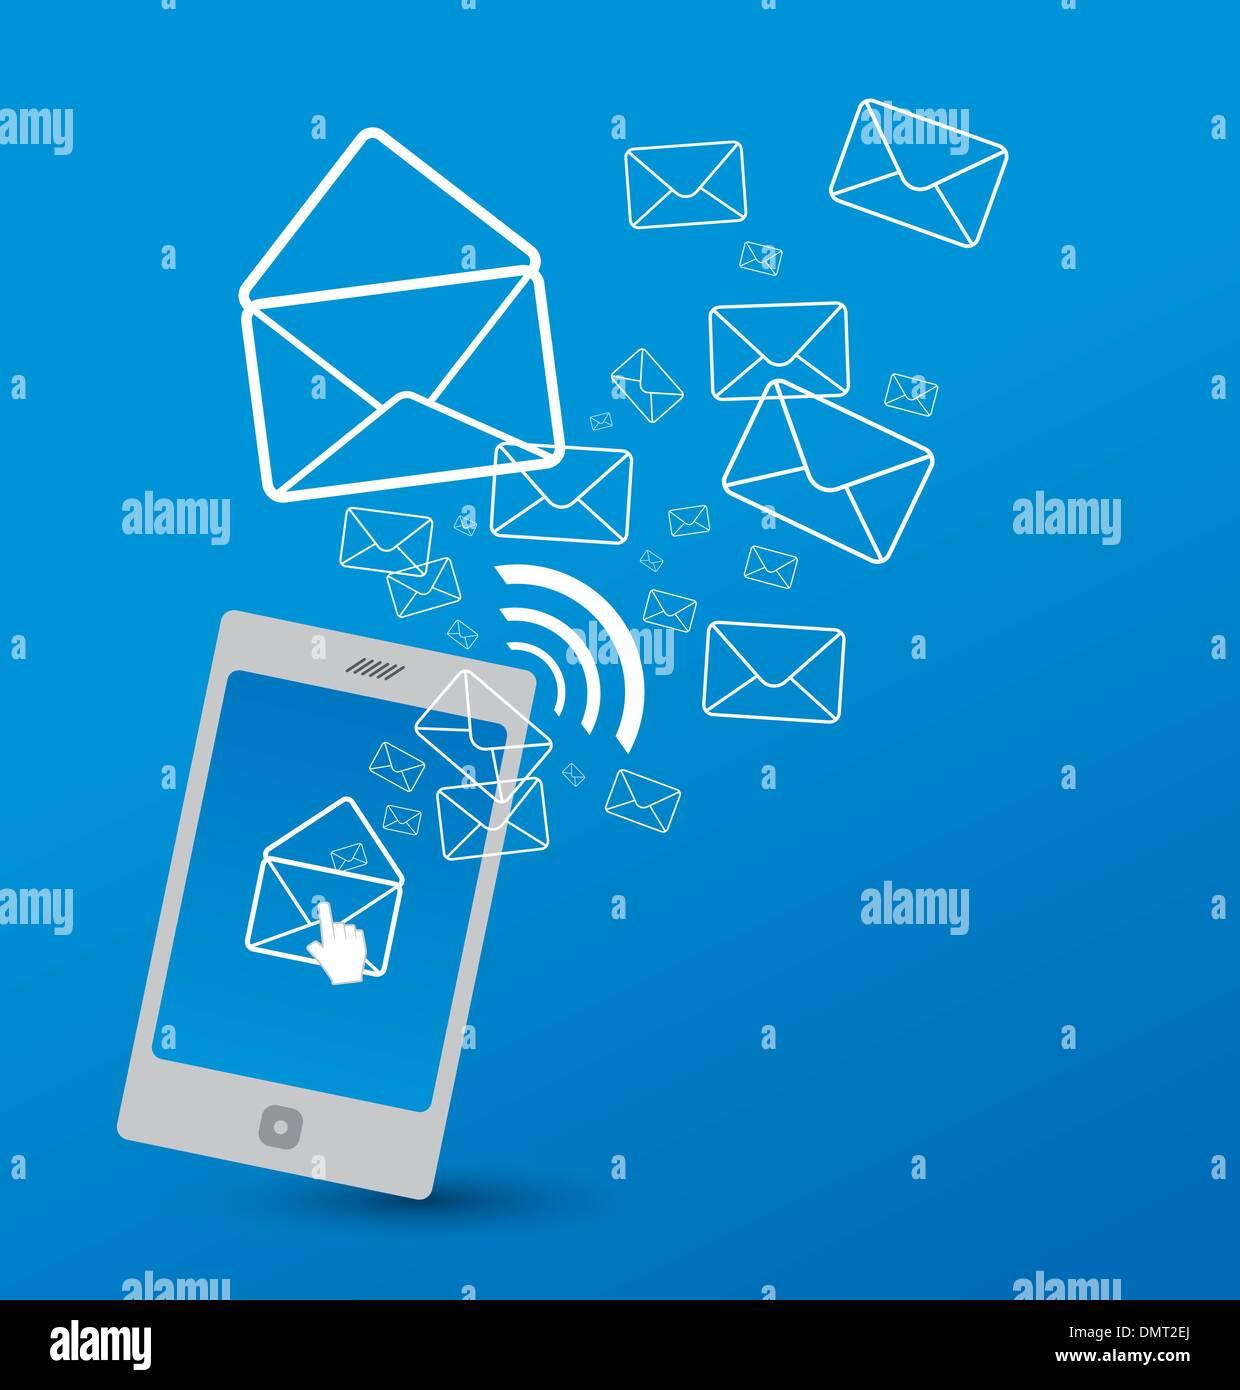 Sending SMS - Stock Image